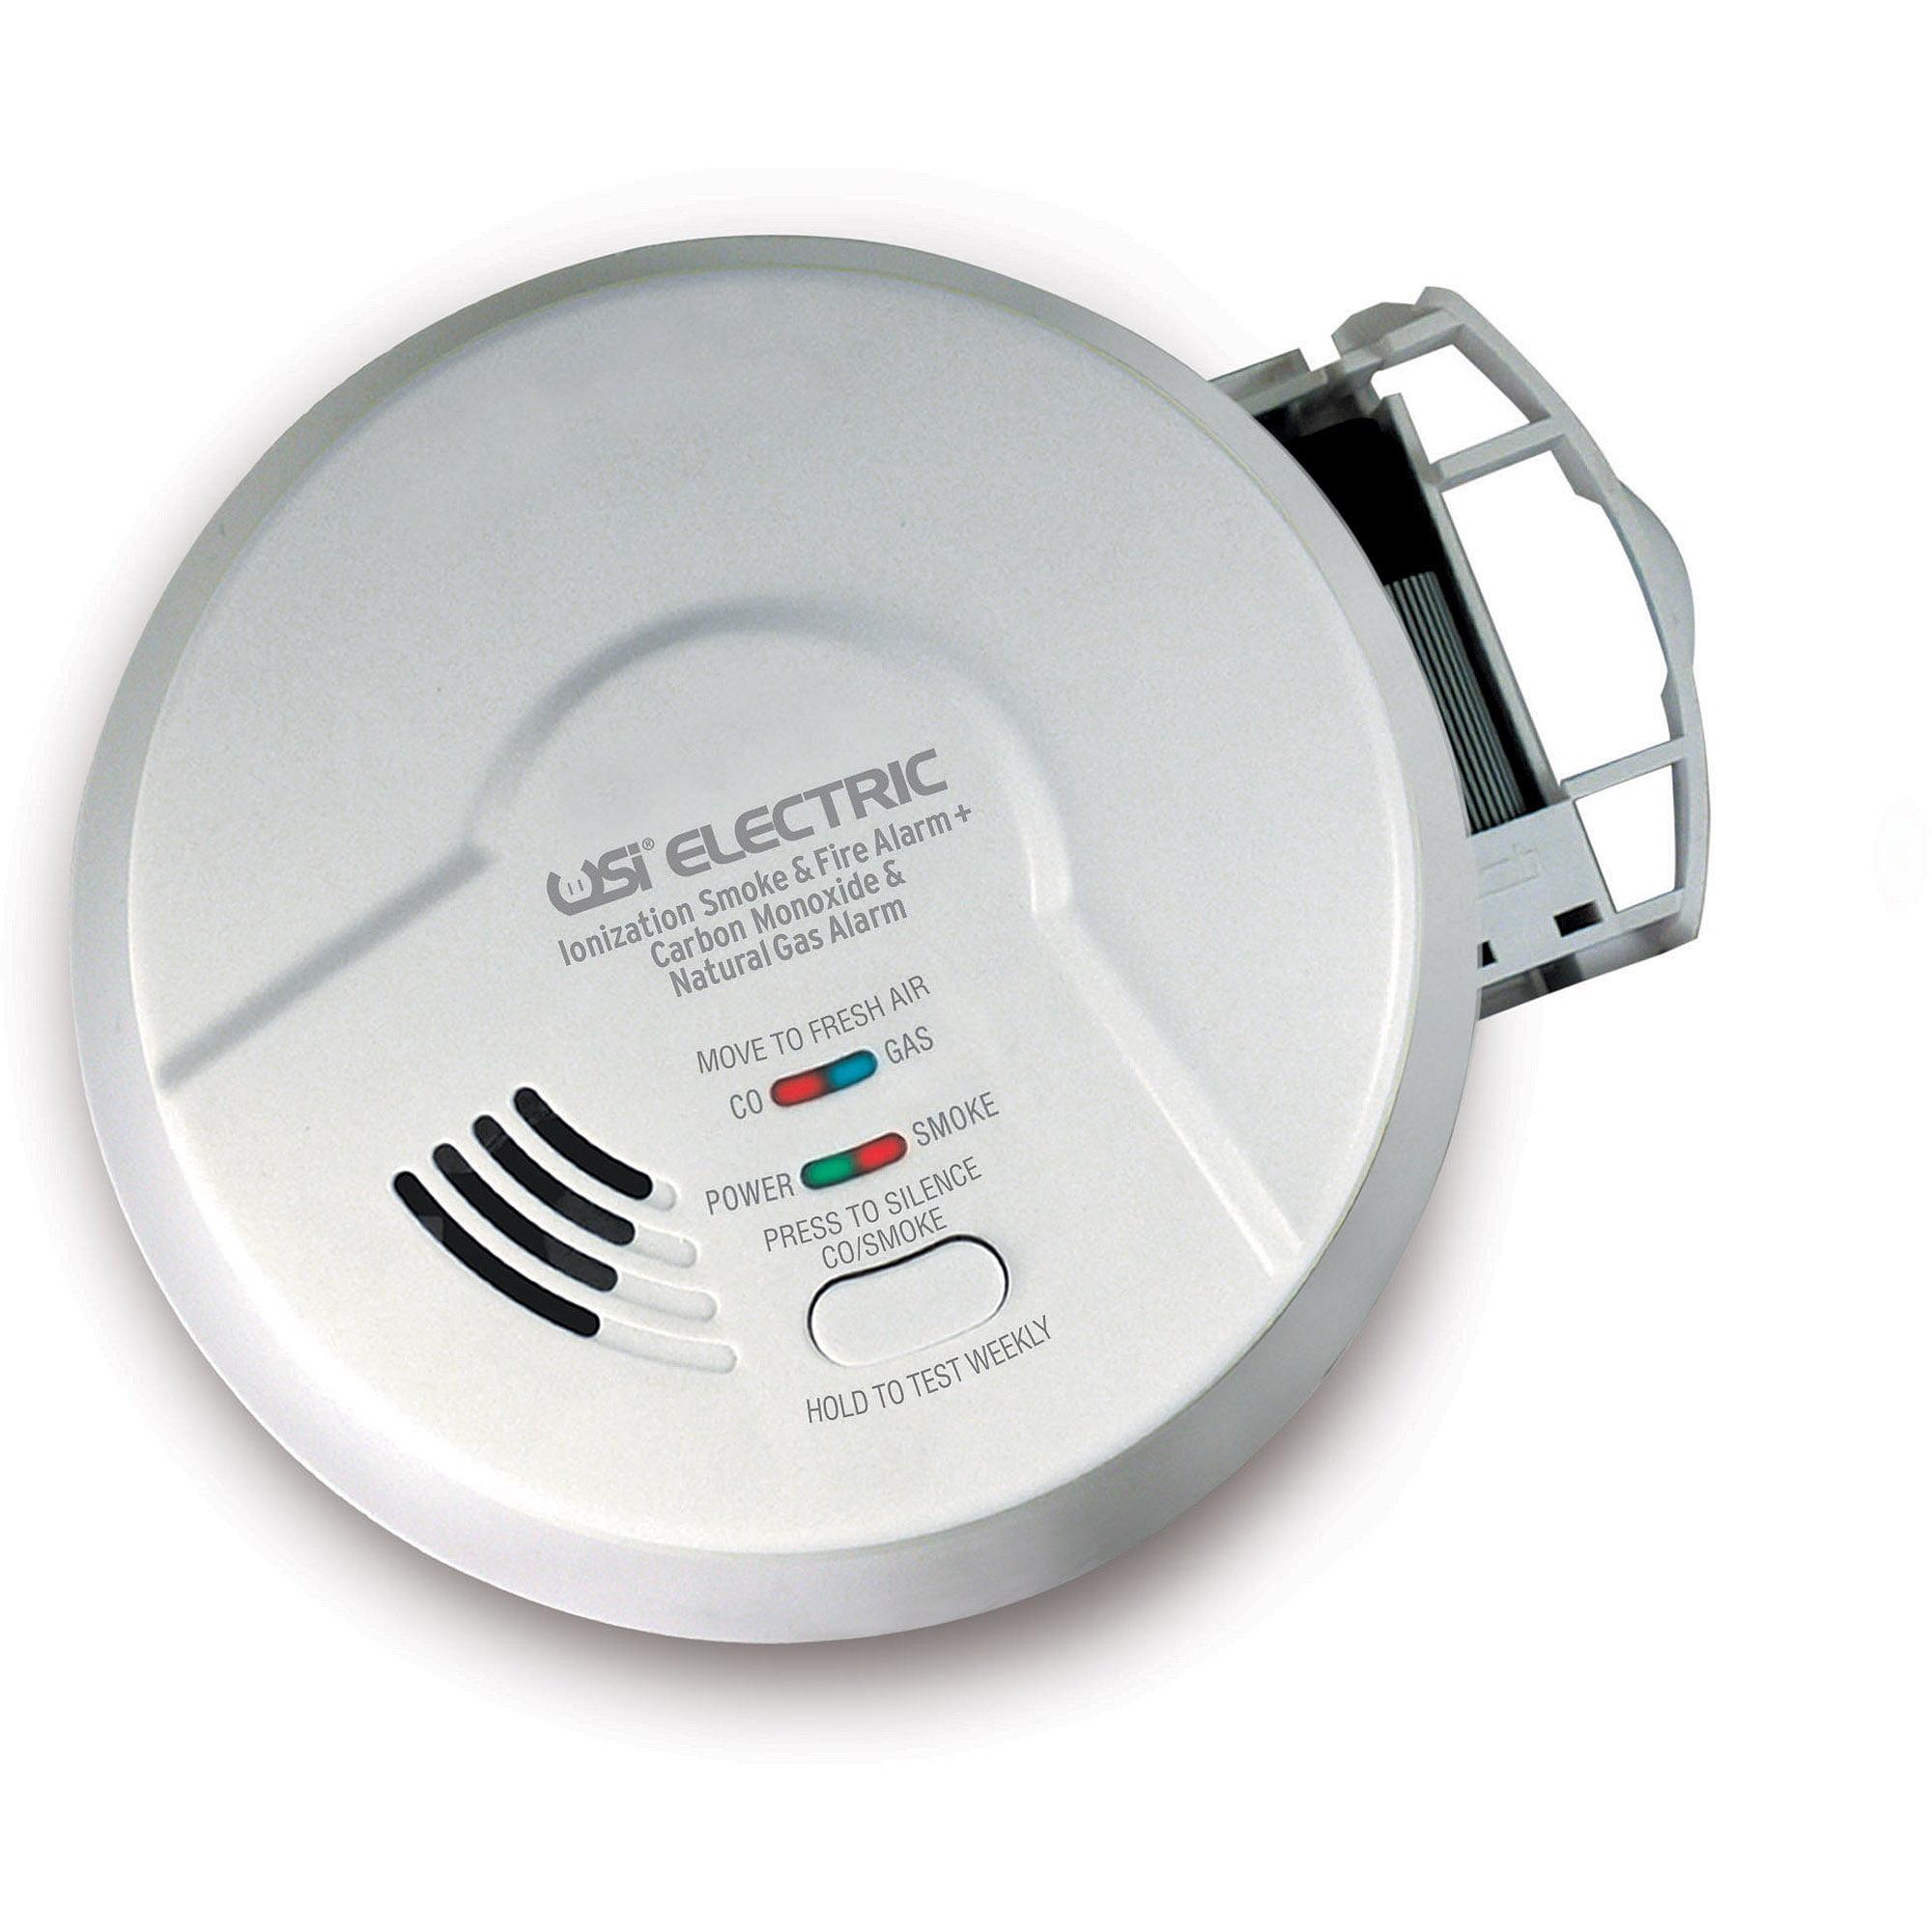 USI MICN109 3-in-1 IoPhic Smoke, Carbon Monoxide and Natu...